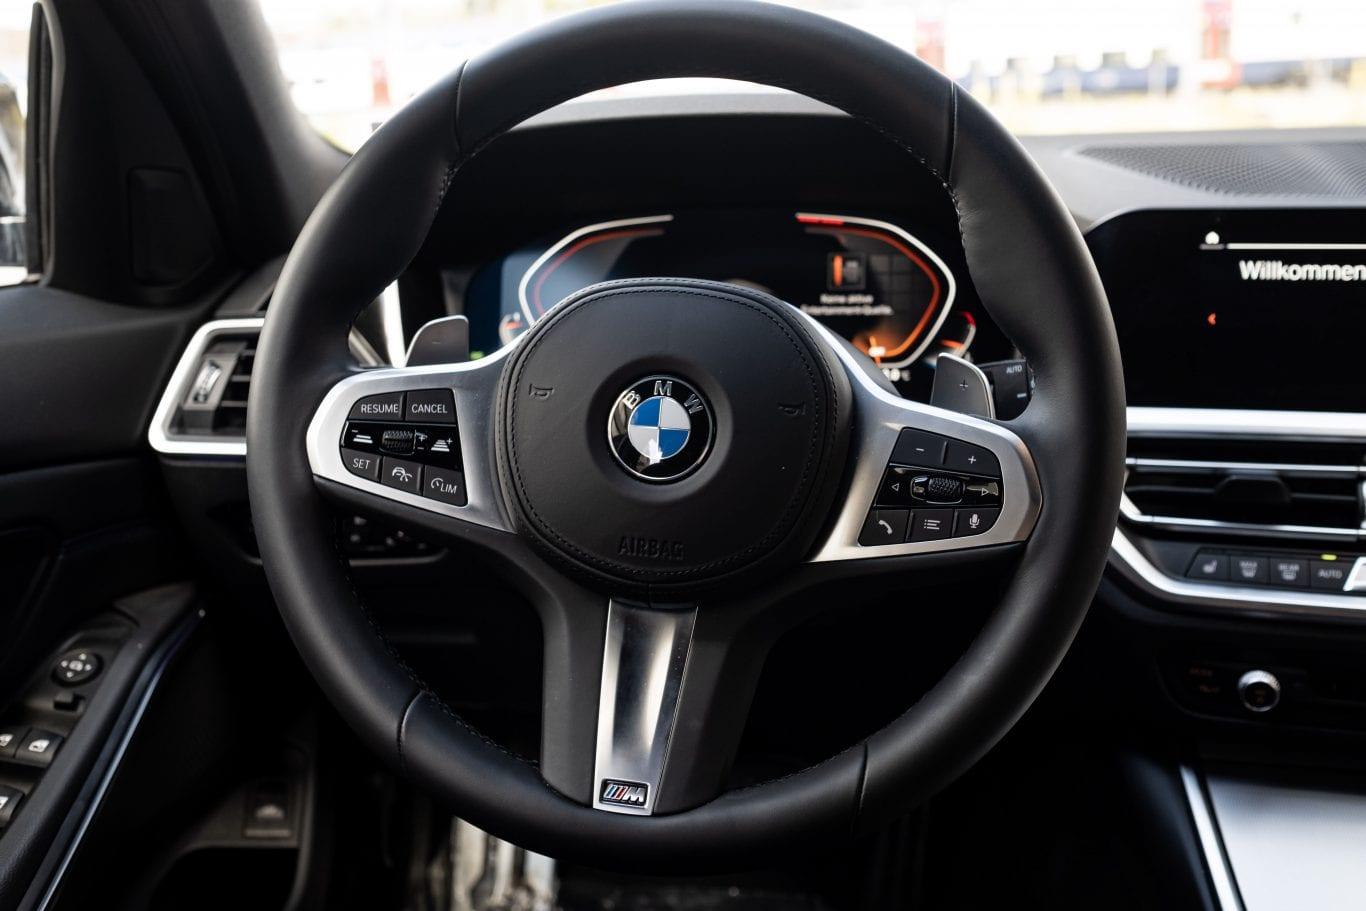 Sonderverkauf verlängert bis 06.08.2020 - Auto Kunz AG 59